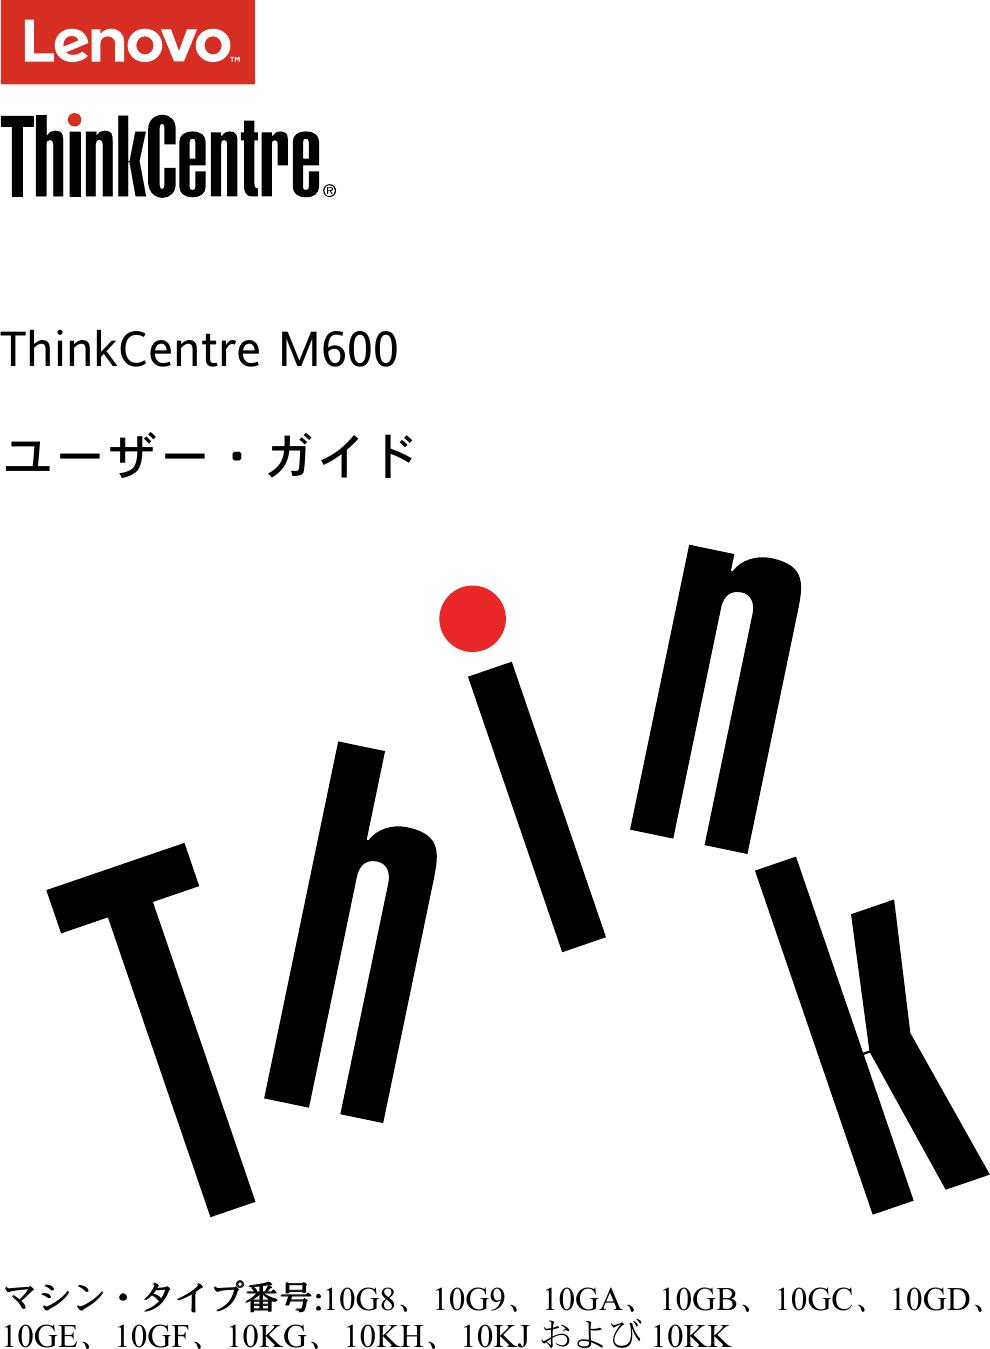 Lenovo M600 Ug Ja User Manual (日本語) ユーザーガイド Think Centre